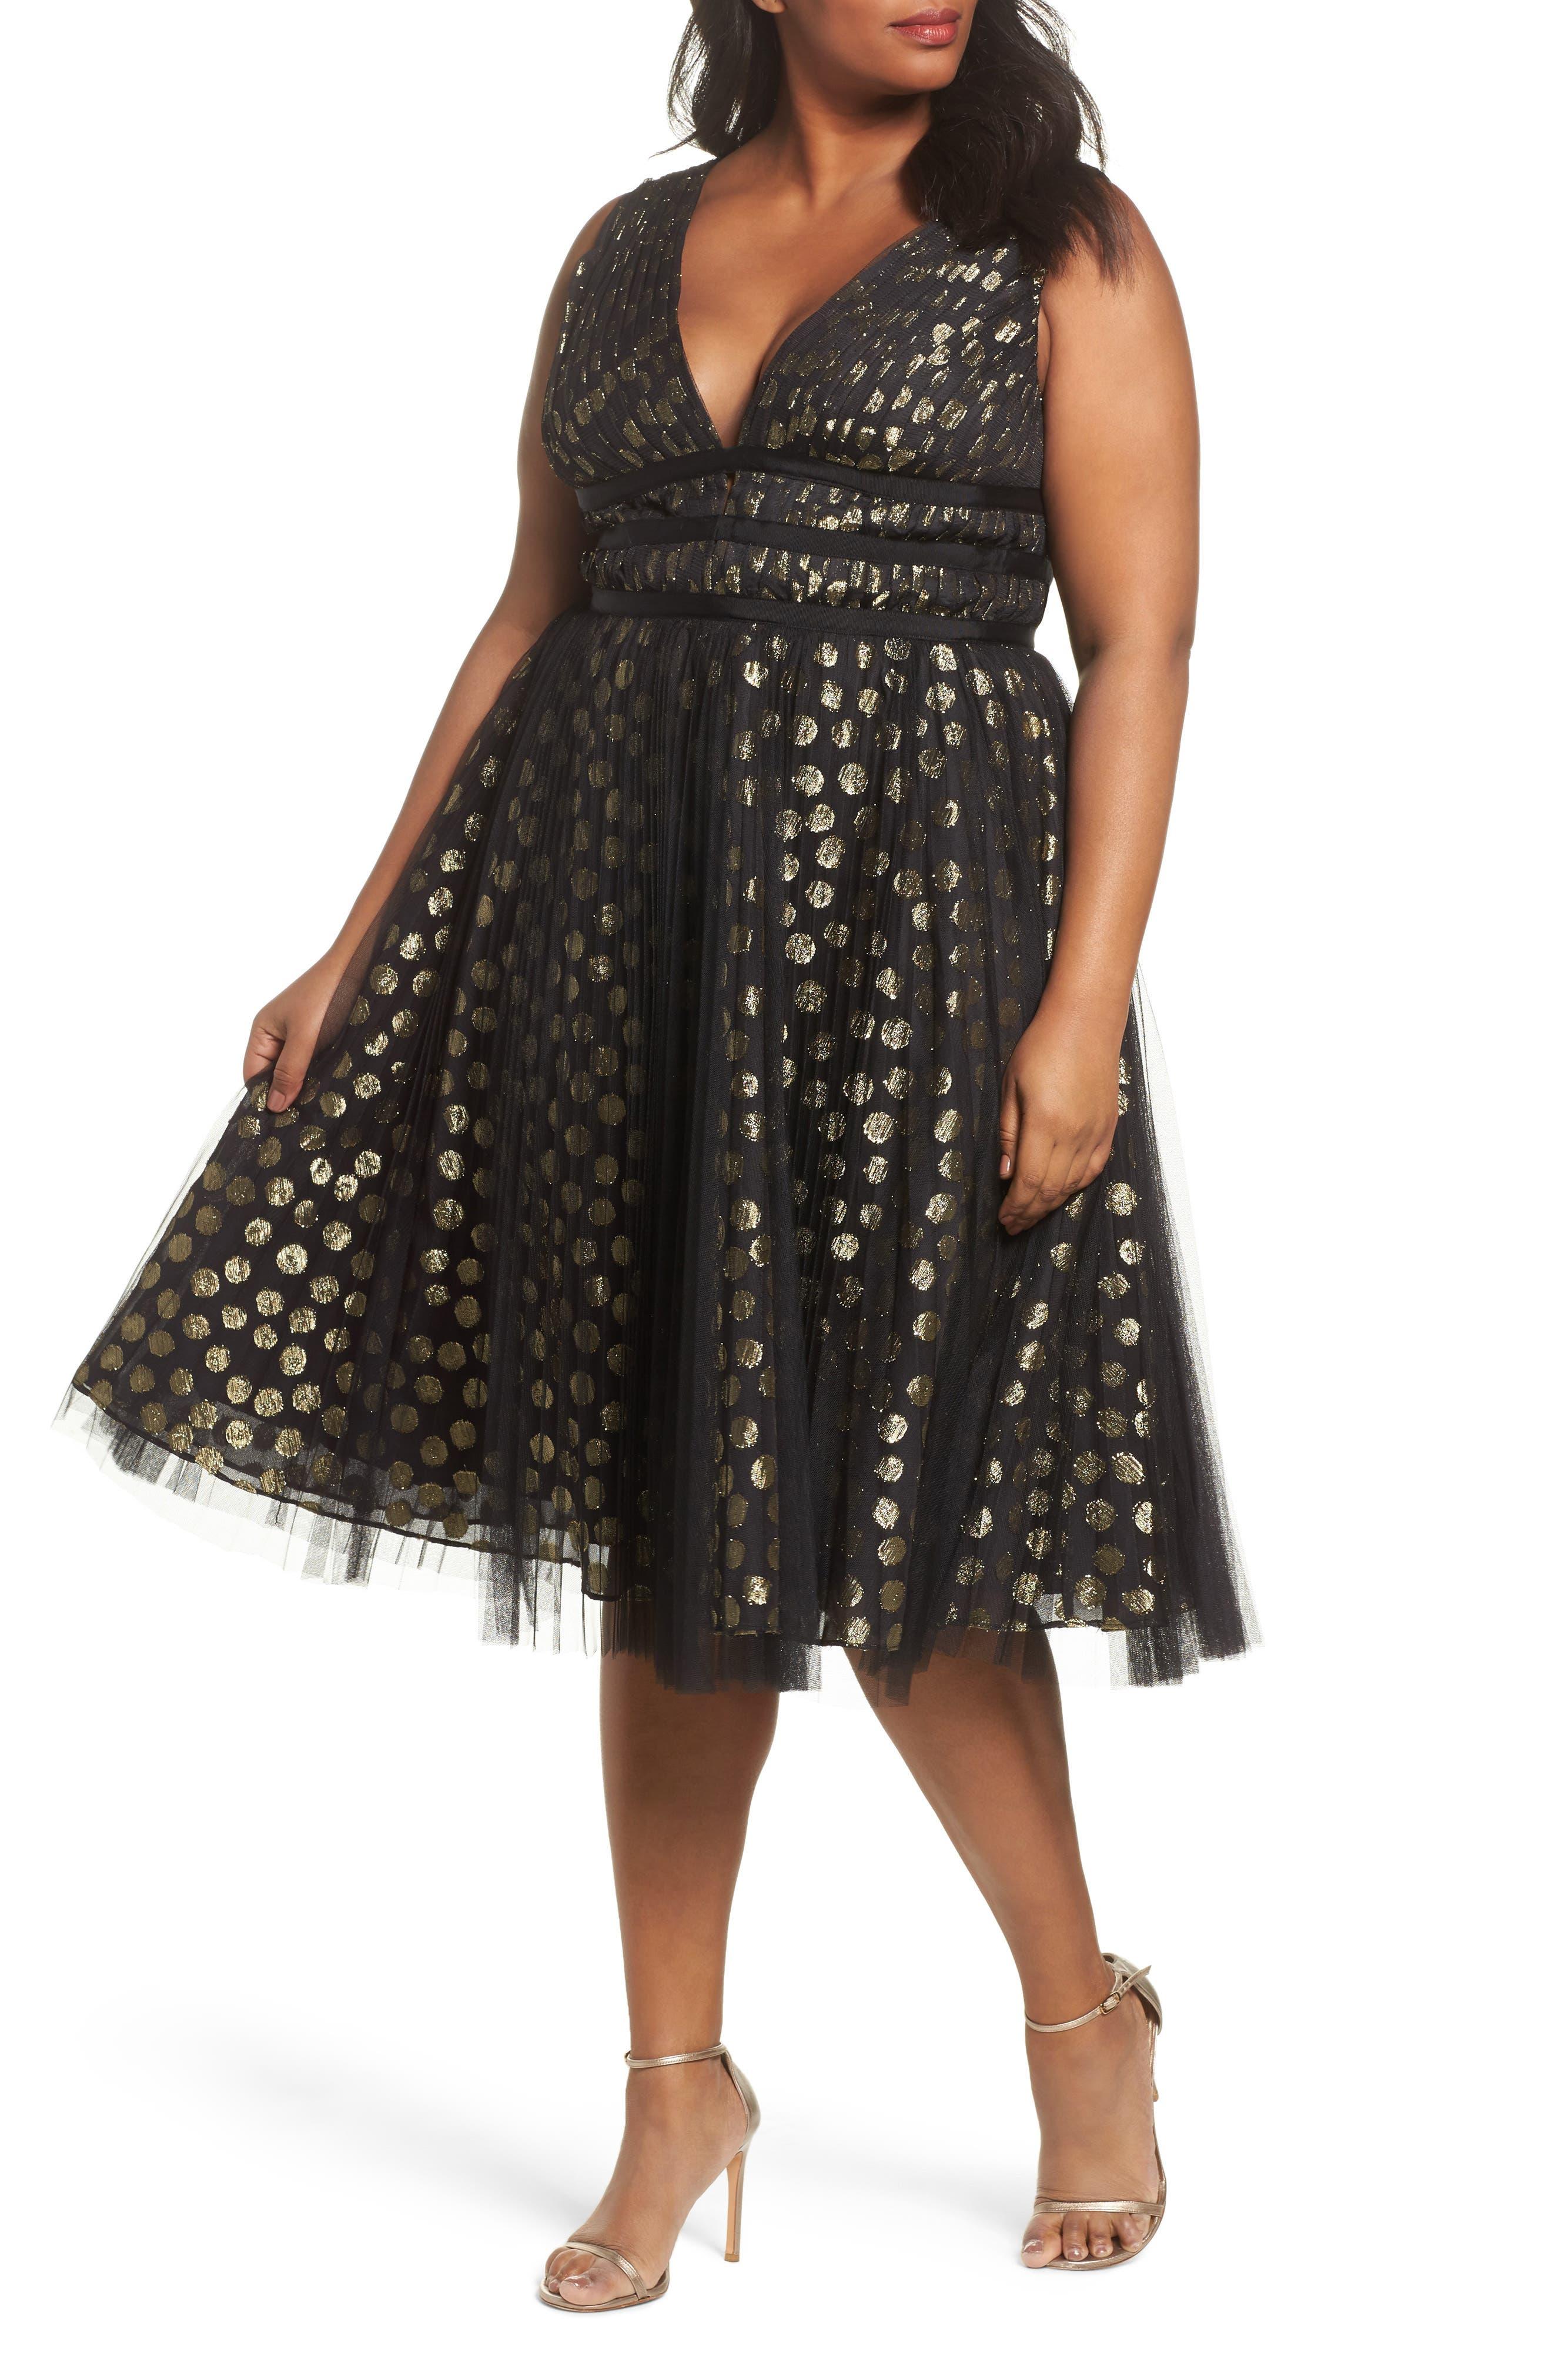 Adrianna Papell Shirred Metallic Dress (Plus Size)